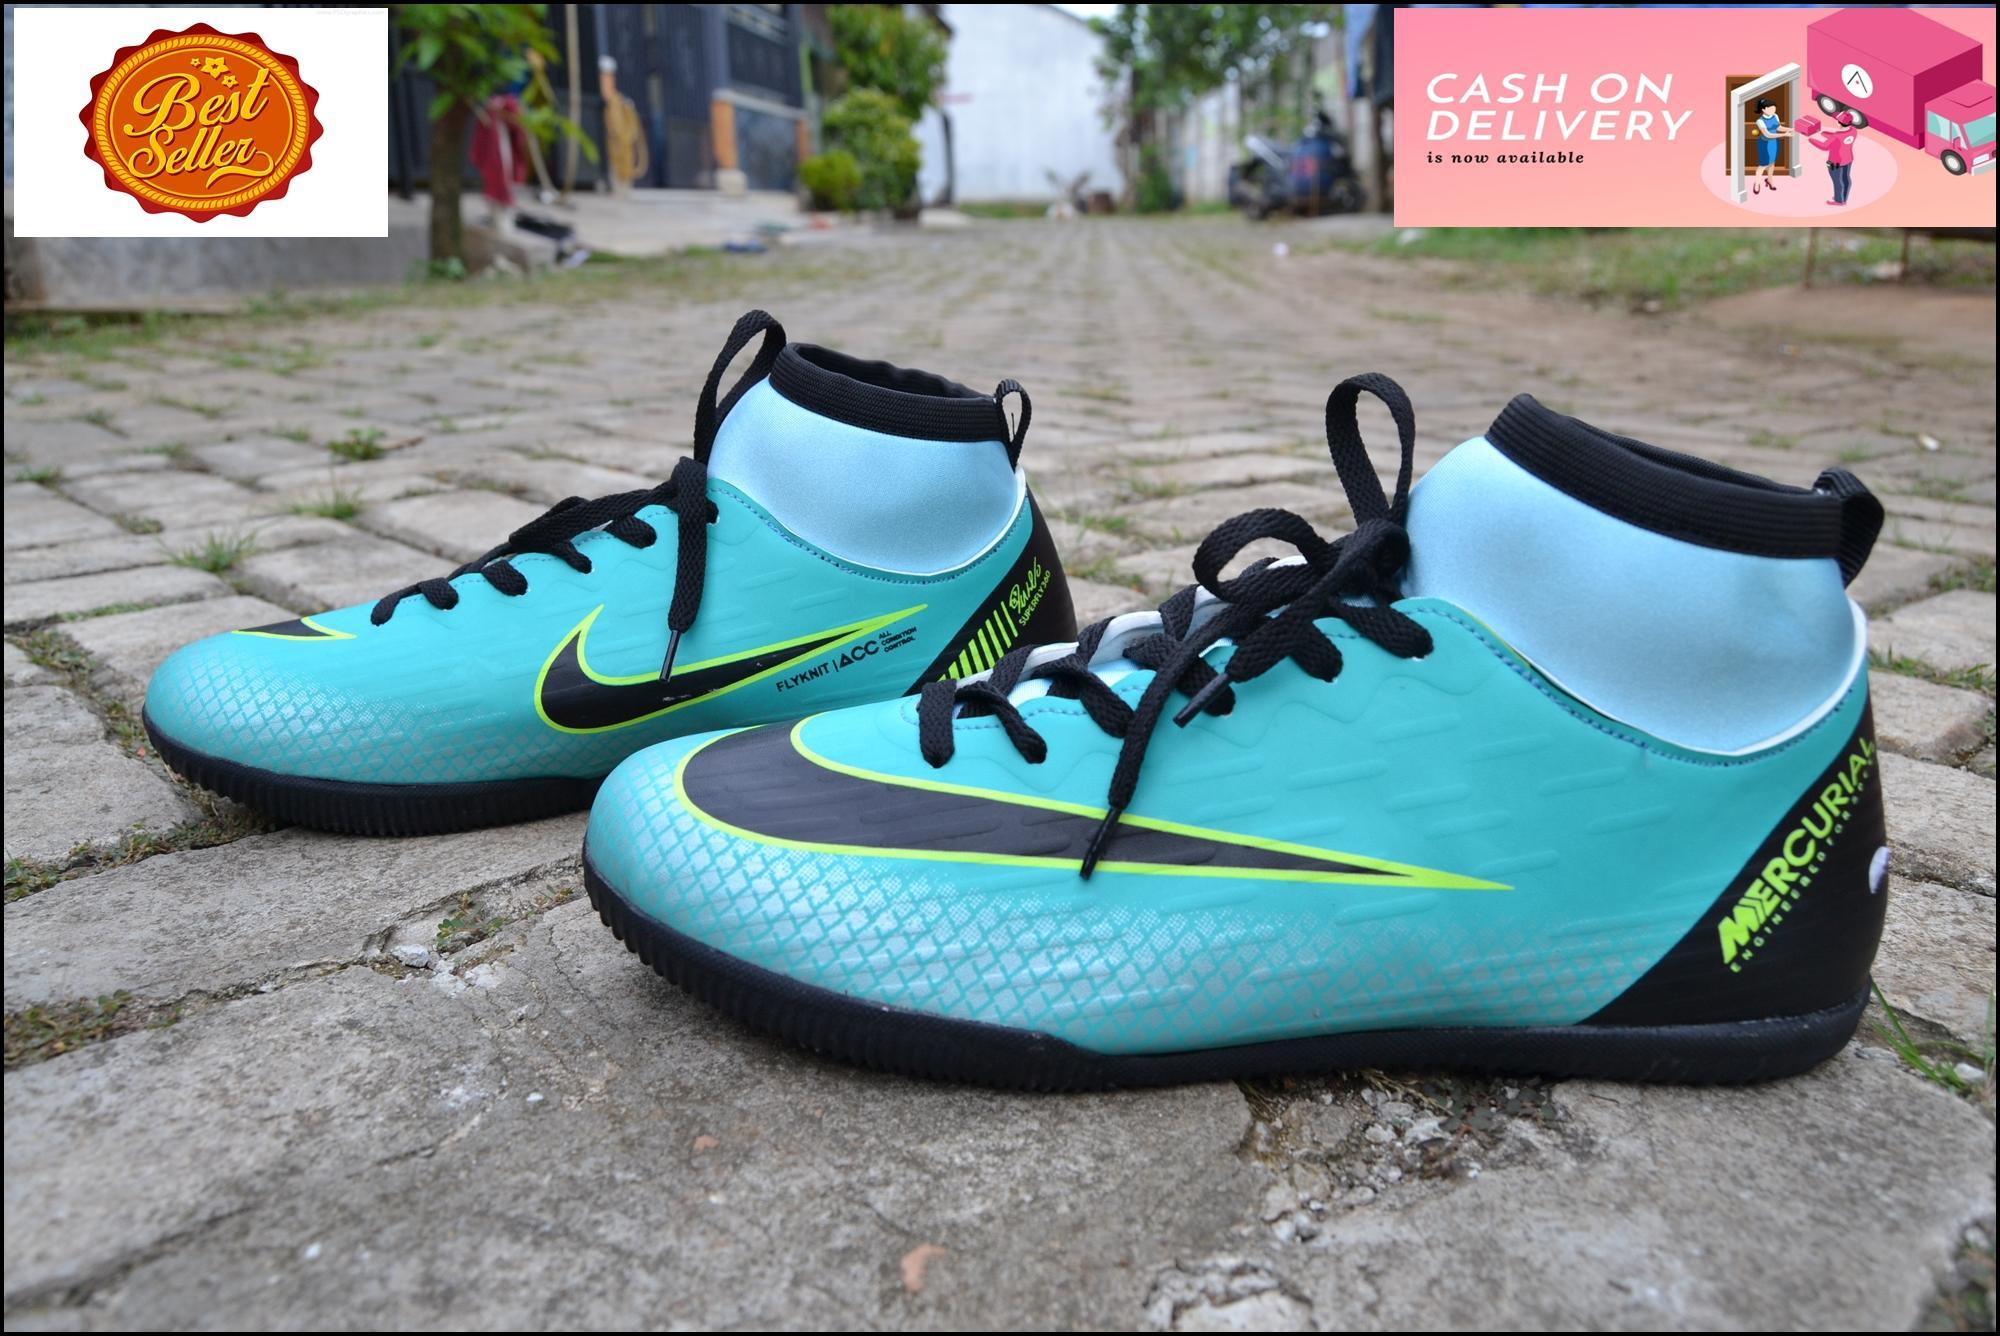 Sepatu Futsal Pria Dewasa Nik Mercurial Boots Termurah Warna Tosca 7ccd06f163